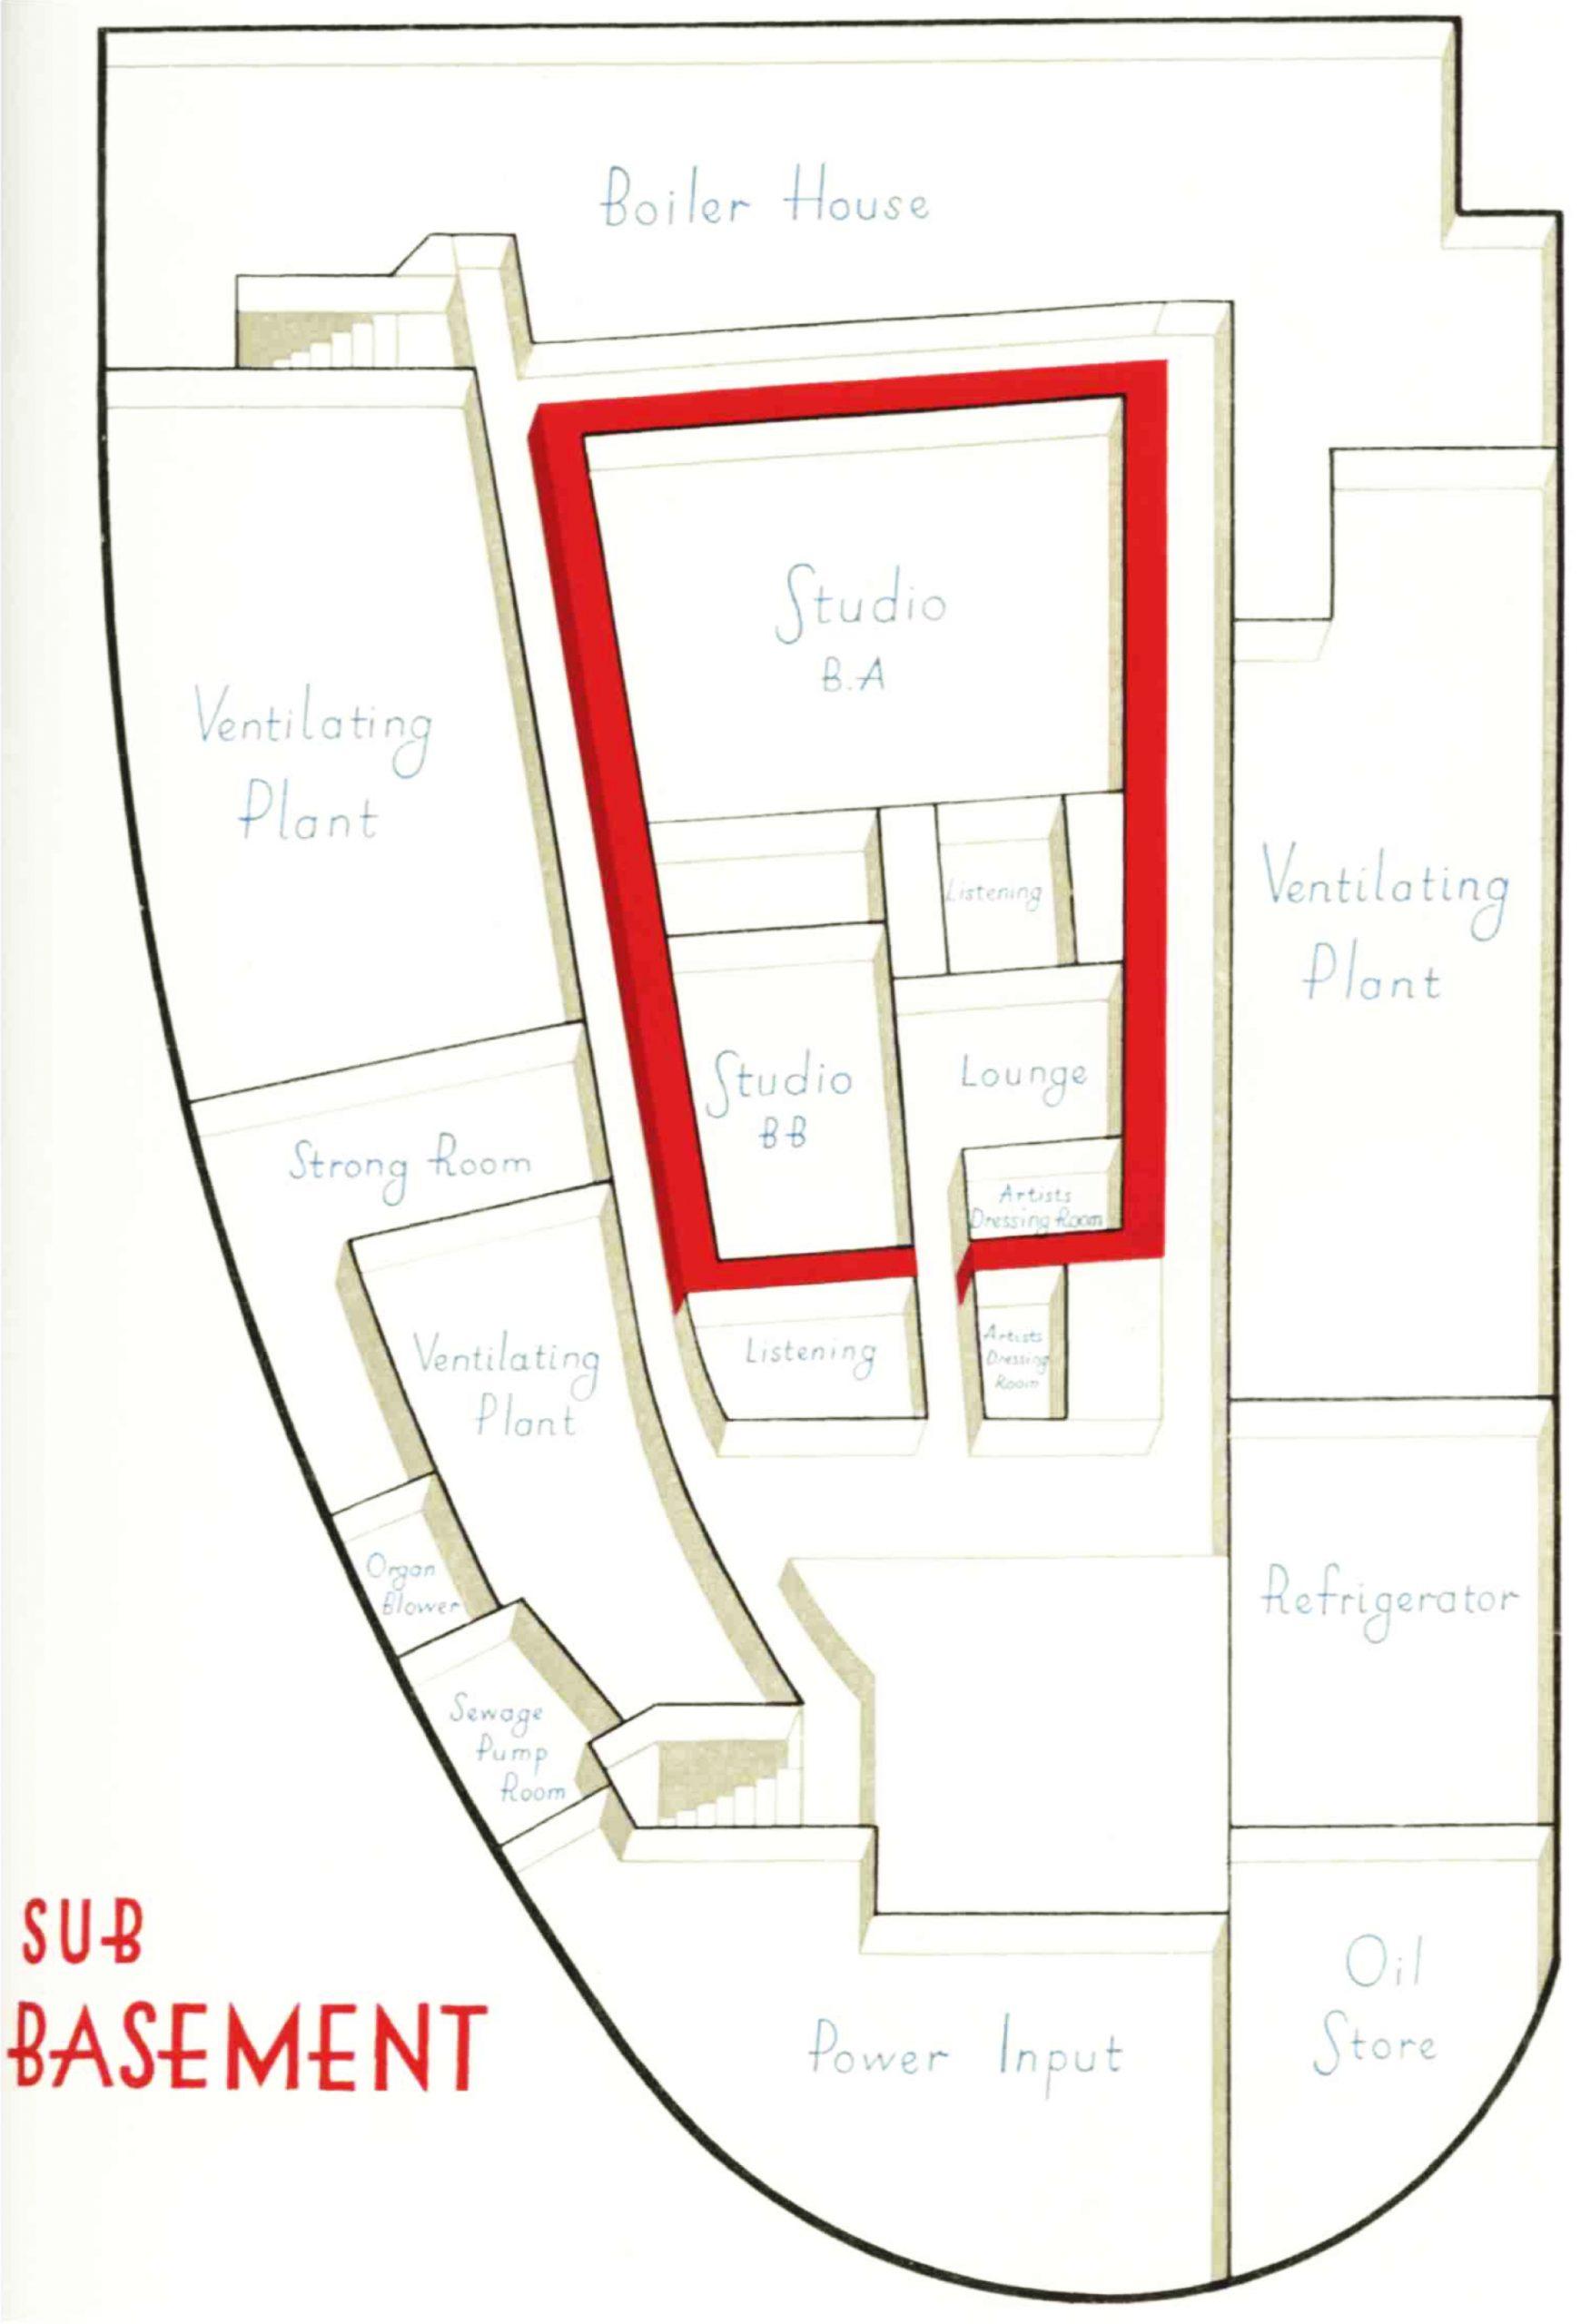 Diagram of the sub-basement